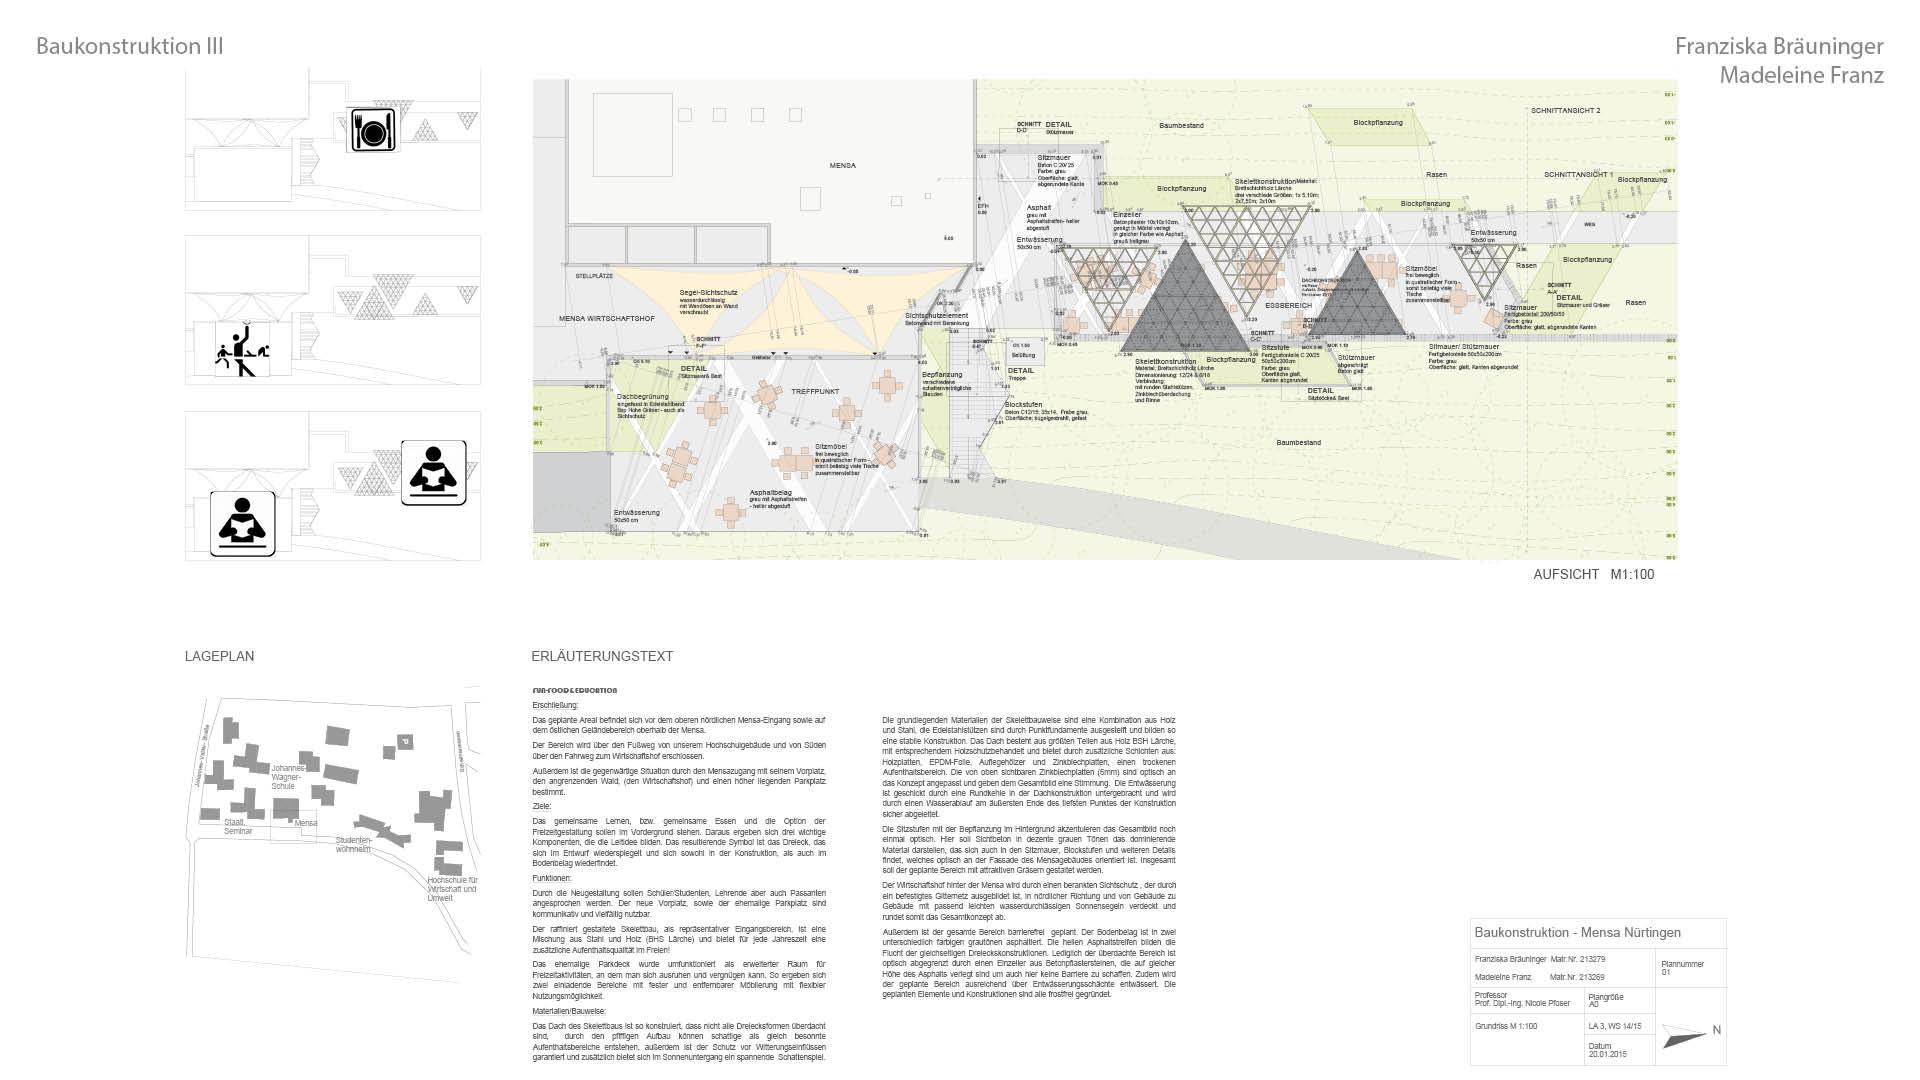 01 14 03 Baukonstruktion III